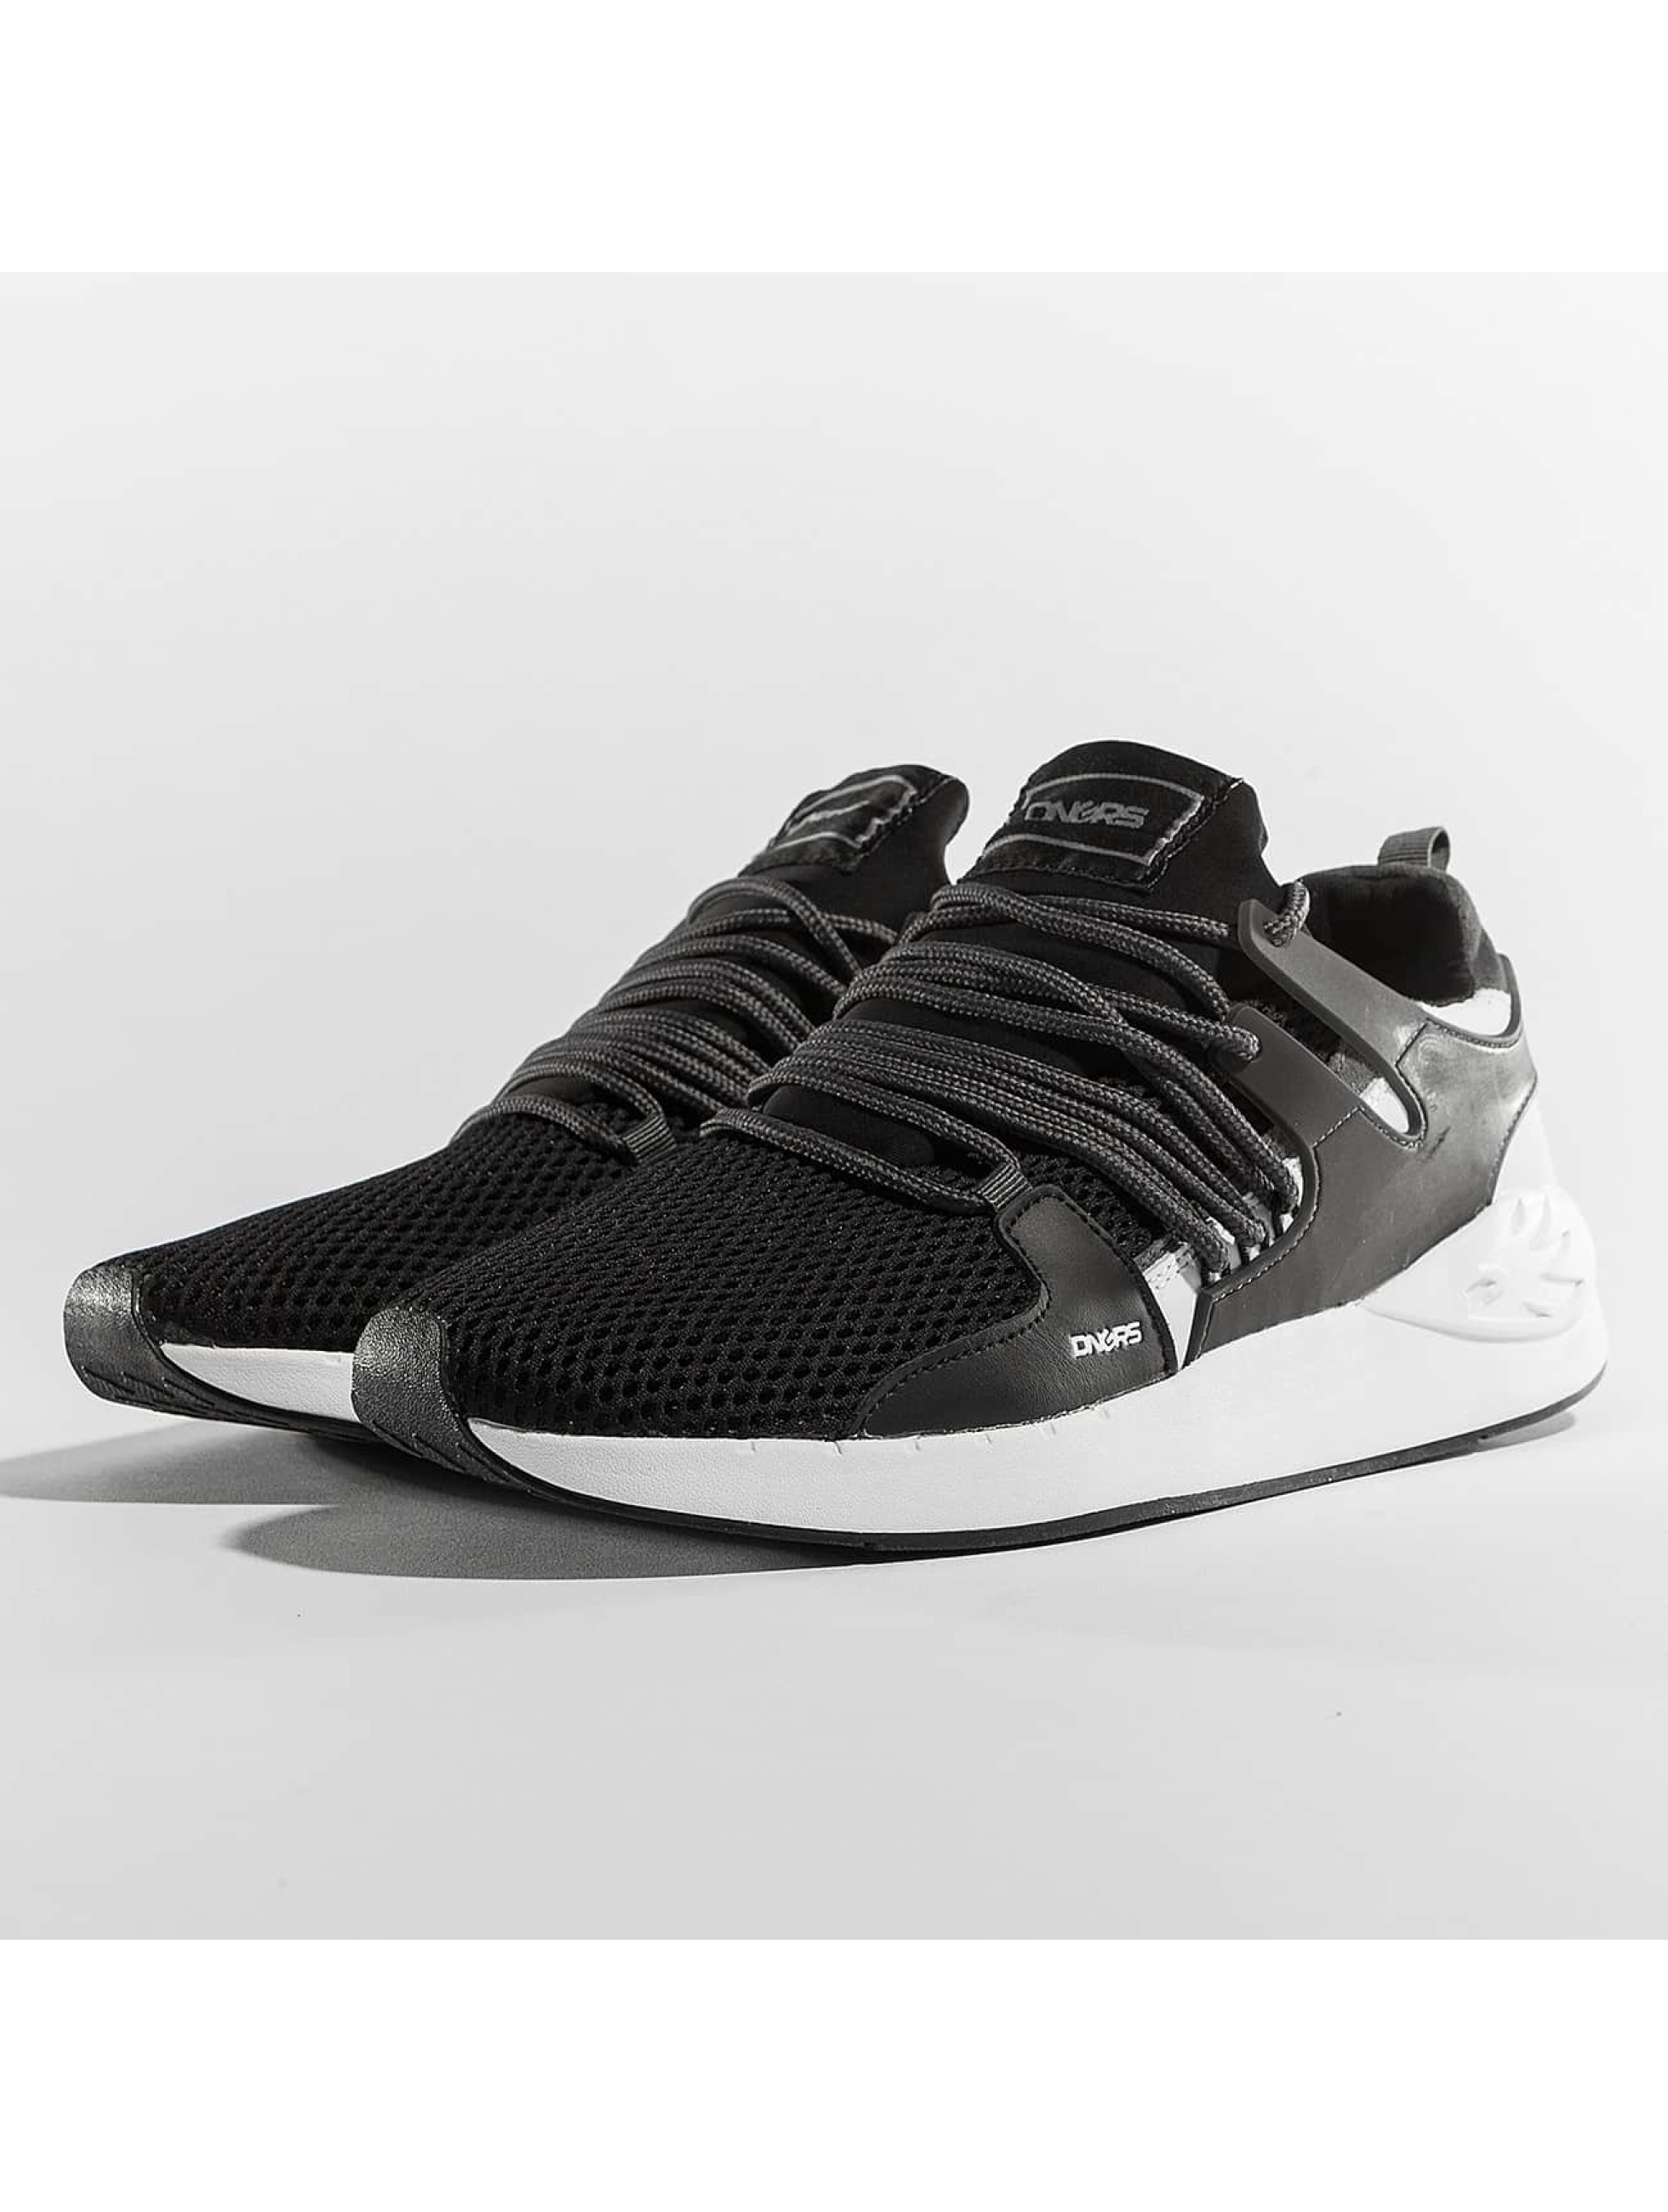 Dangerous DNGRS / Sneakers Bas2 in black 42